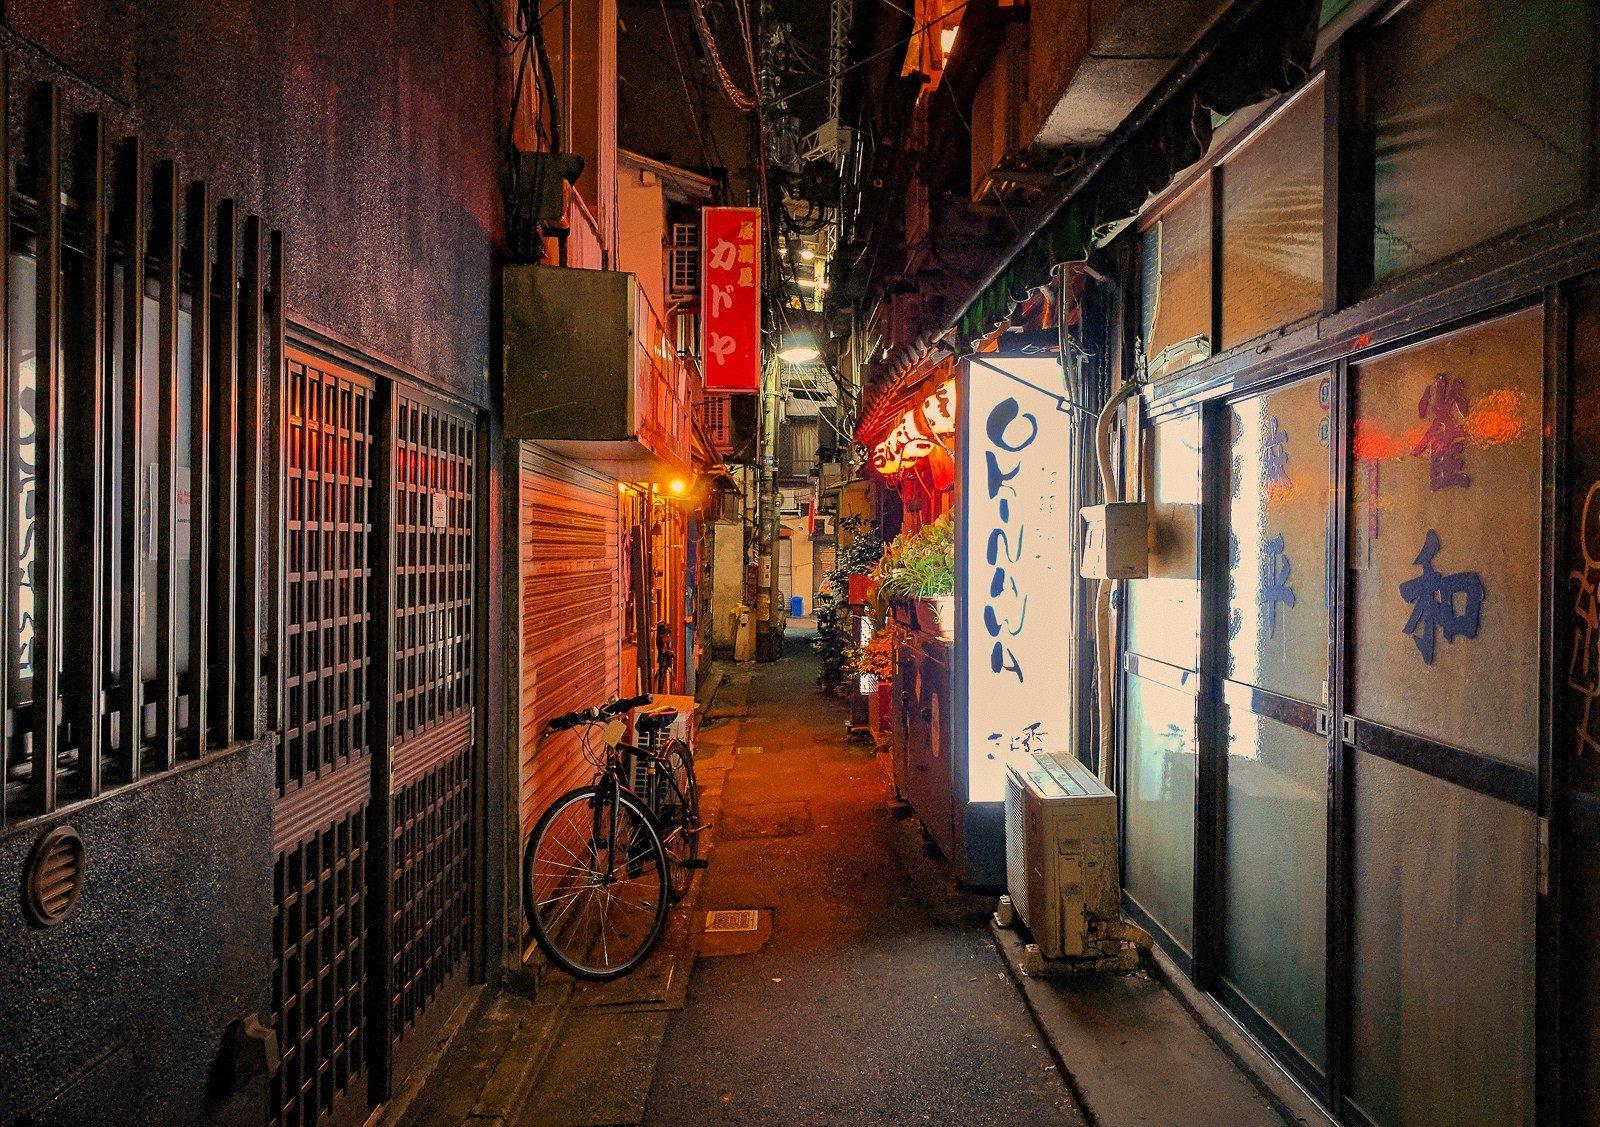 Koenji - The Original Cool Tokyo Neighborhood